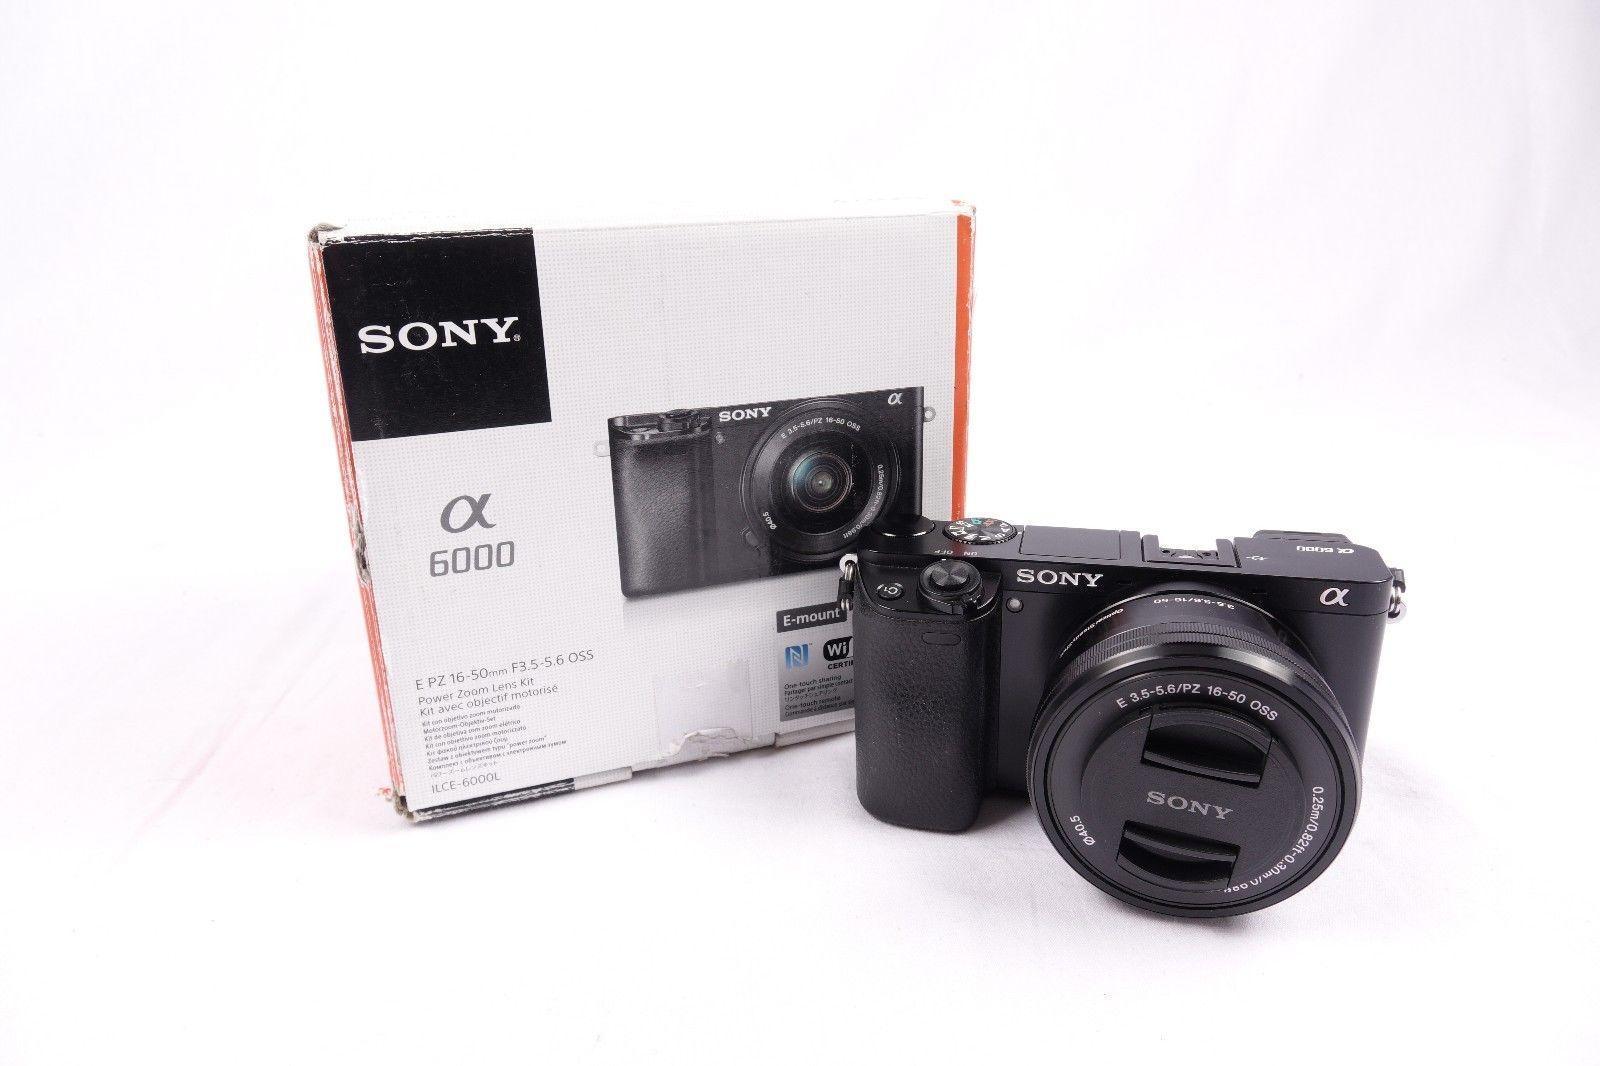 Sony Alpha a 6000 SLR-Digitalkamera+E PZ 16-50mm f/3.5-5.6 OSS - sehr gut - MwSt